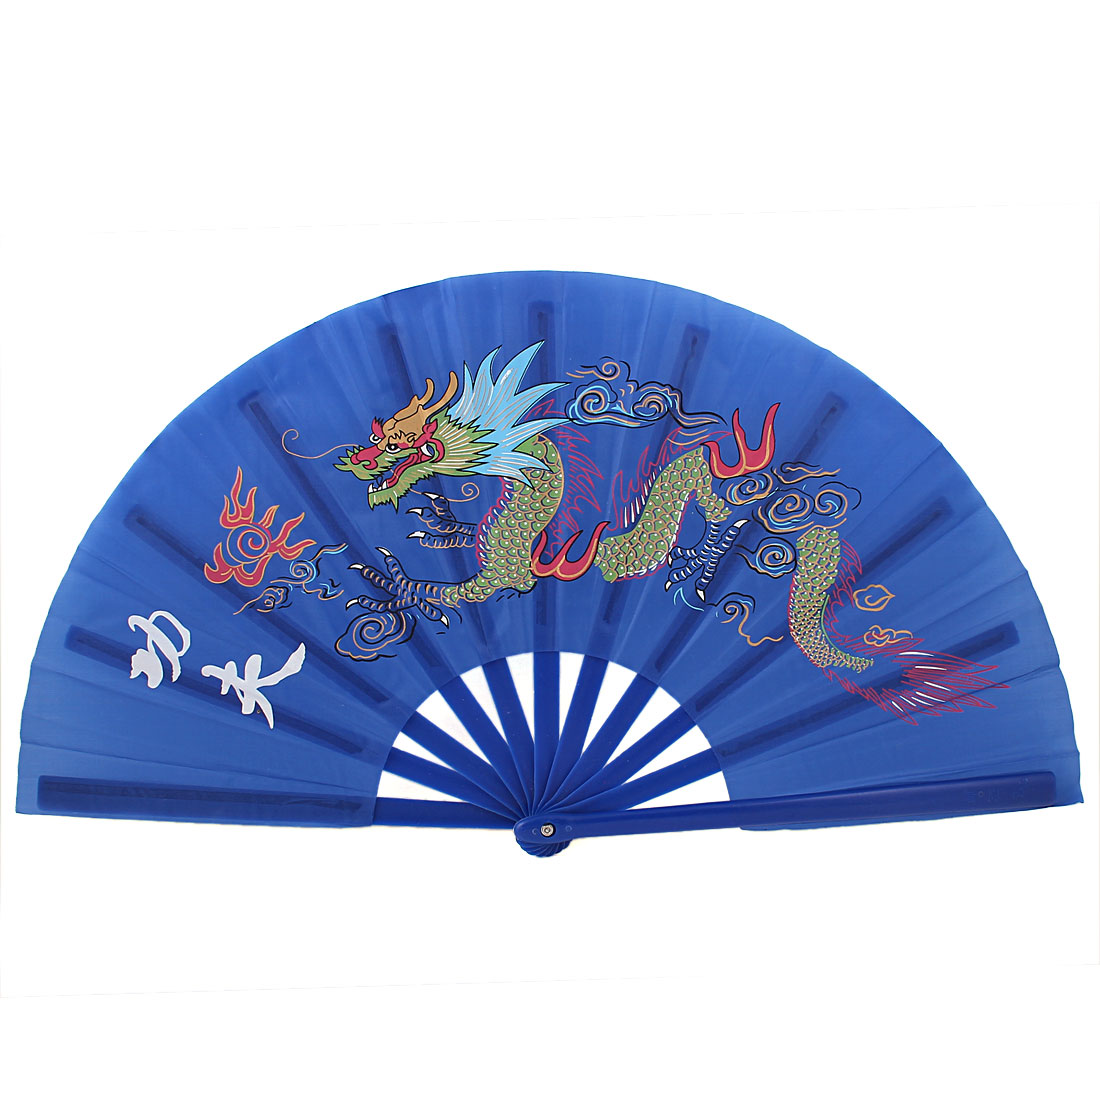 Chinese Kungfu Dragon Print Folding Dancing Exercise Plastic Hand Fan Blue